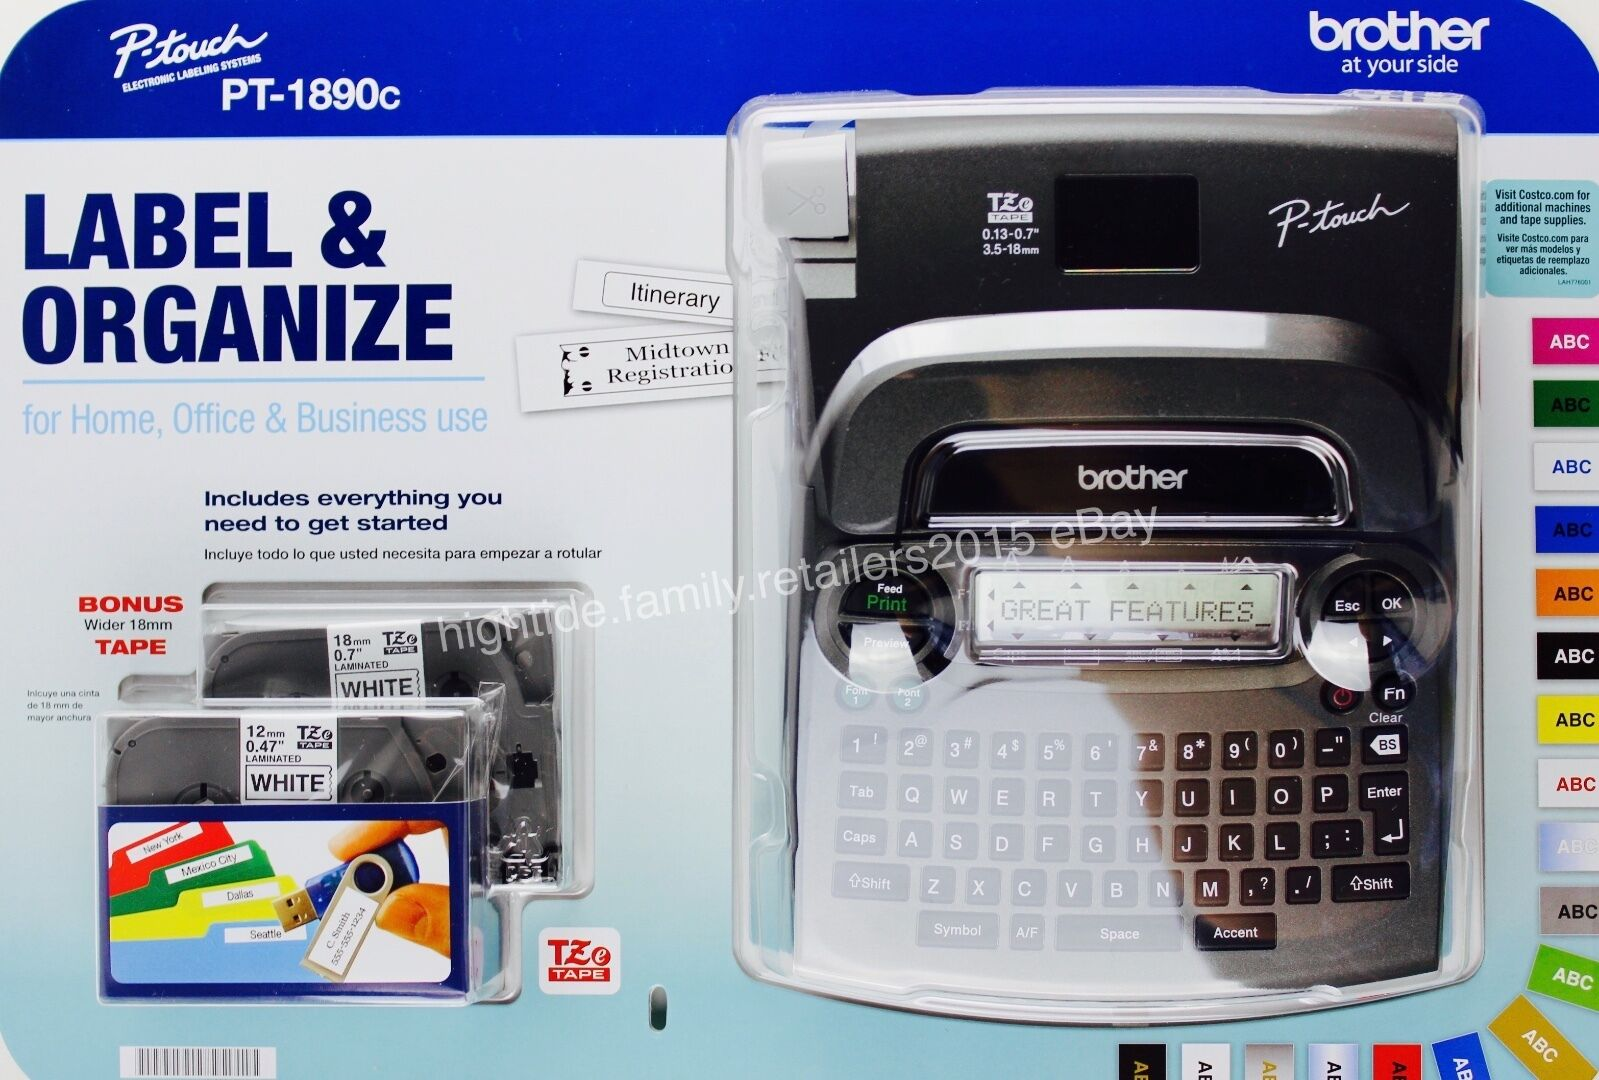 Bredher P-touch PT-1890c Labeling Maker System Bonus 6  AA  Batteries & 2 Tapes